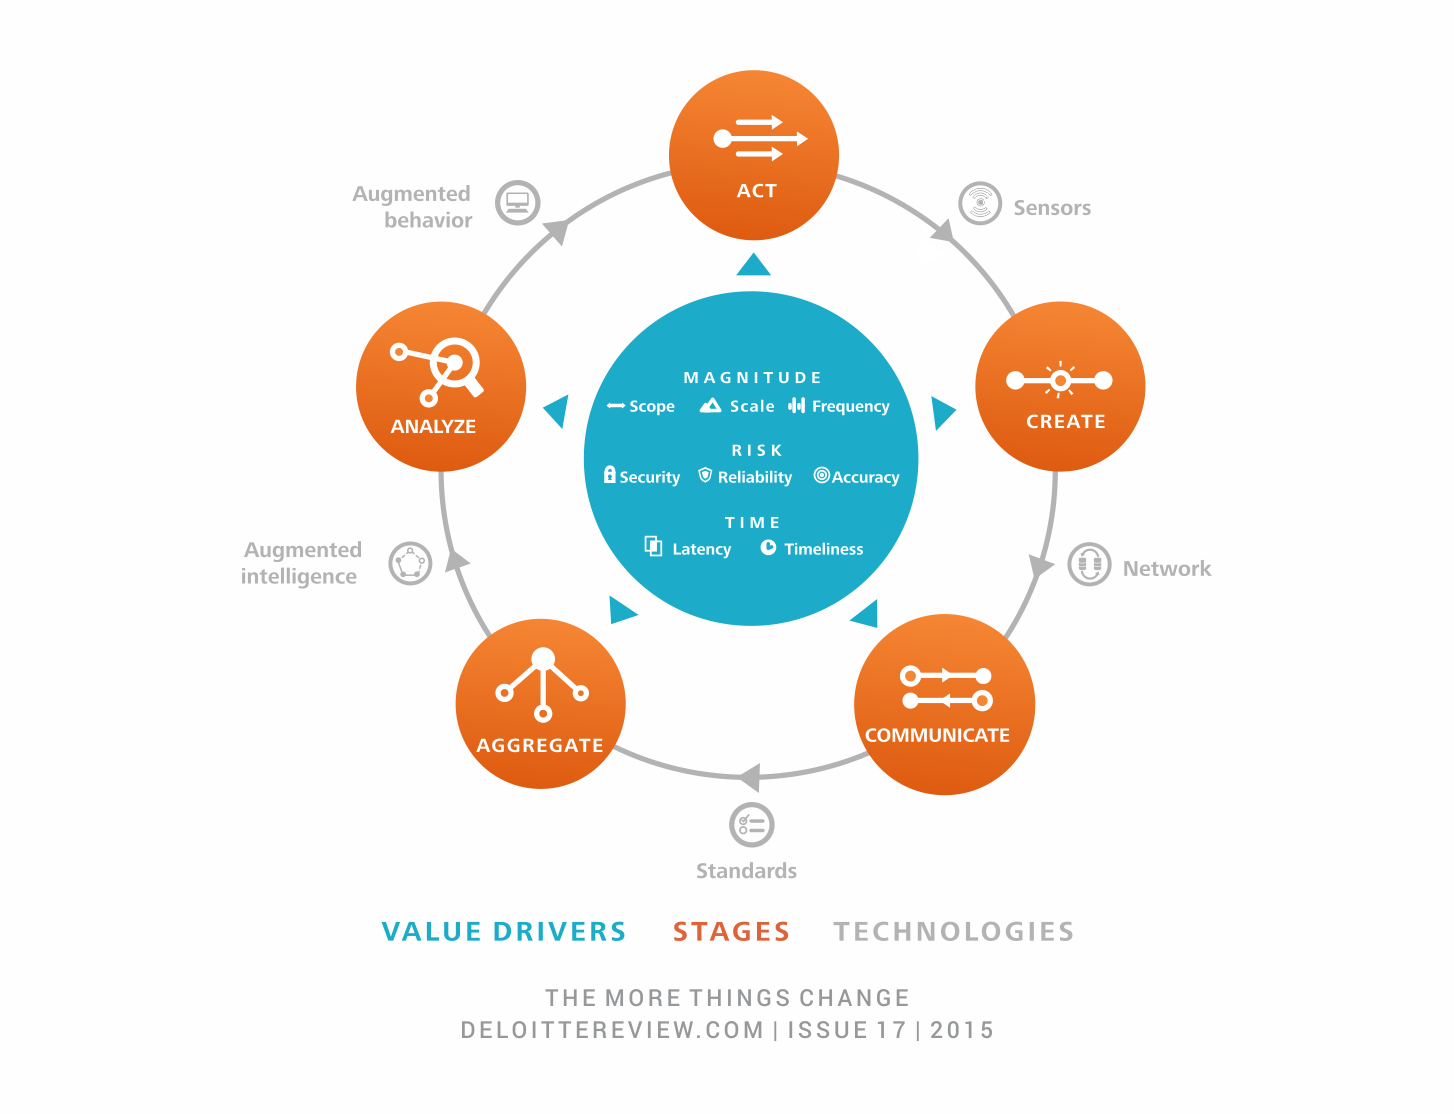 flow of information value is Deloitte's Information Value Loop